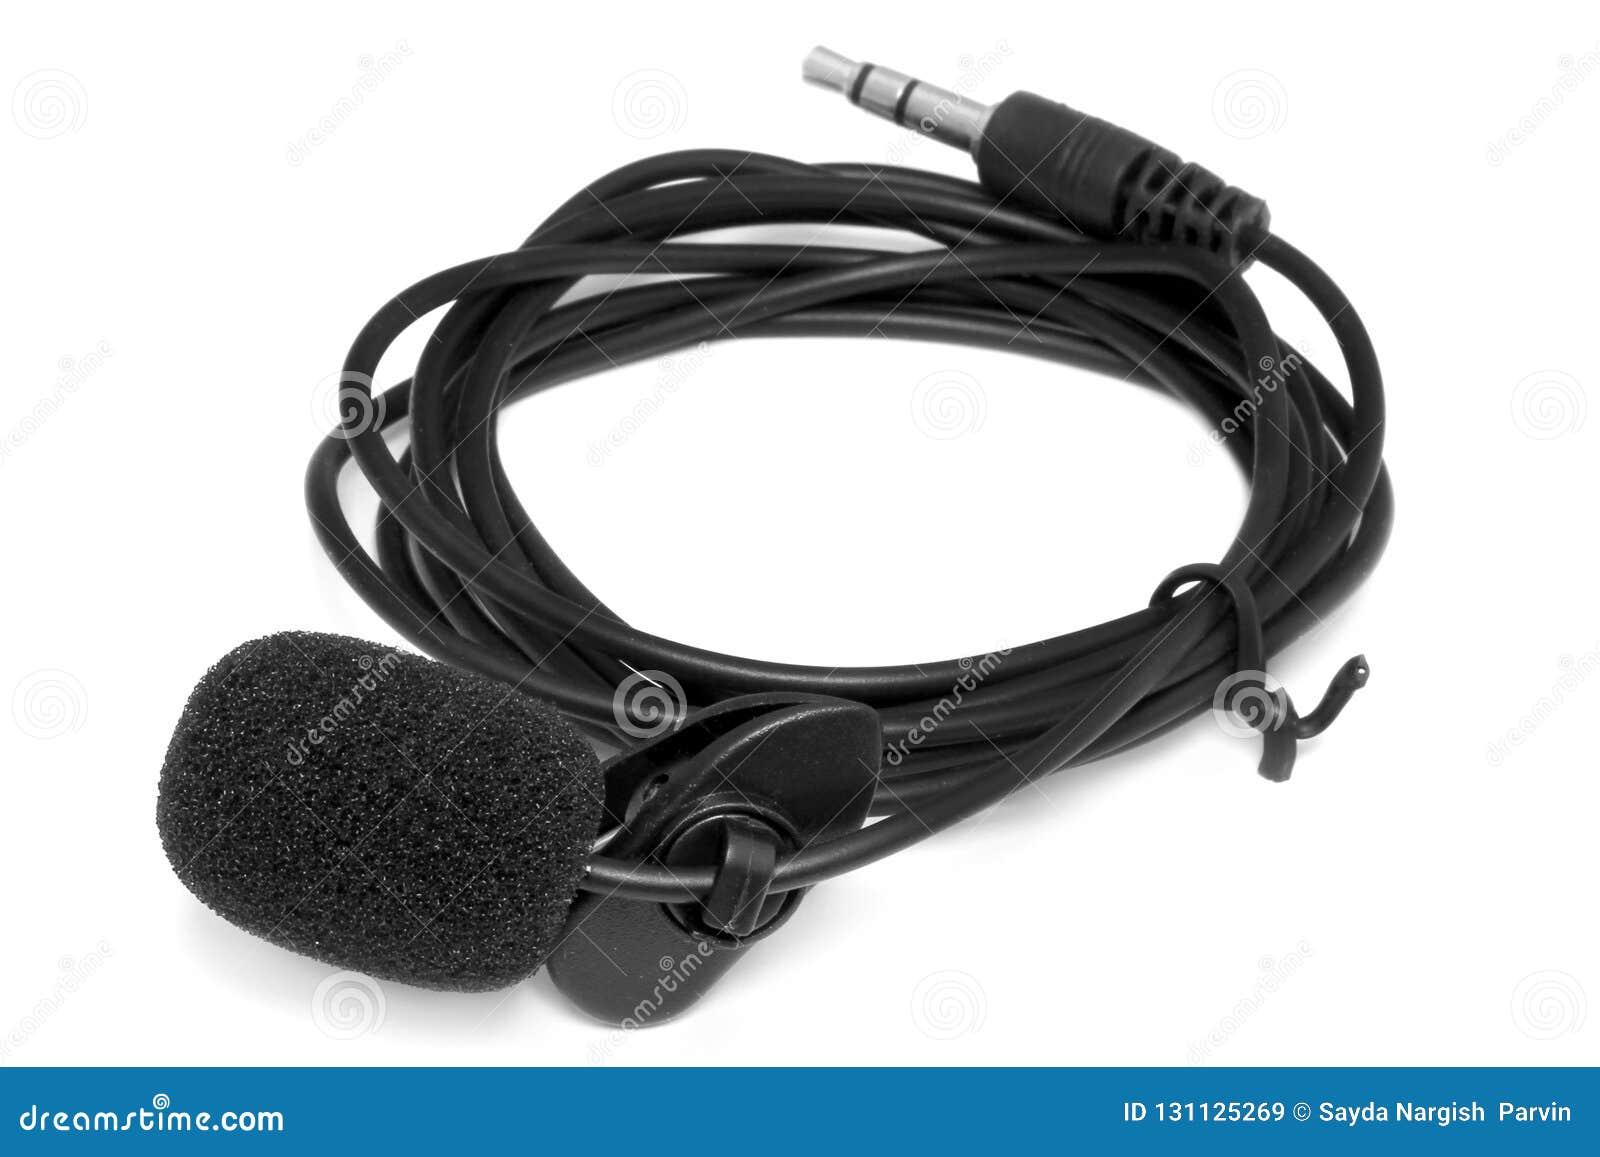 Kondensatorowy lavalier krawat klamerki mikrofon